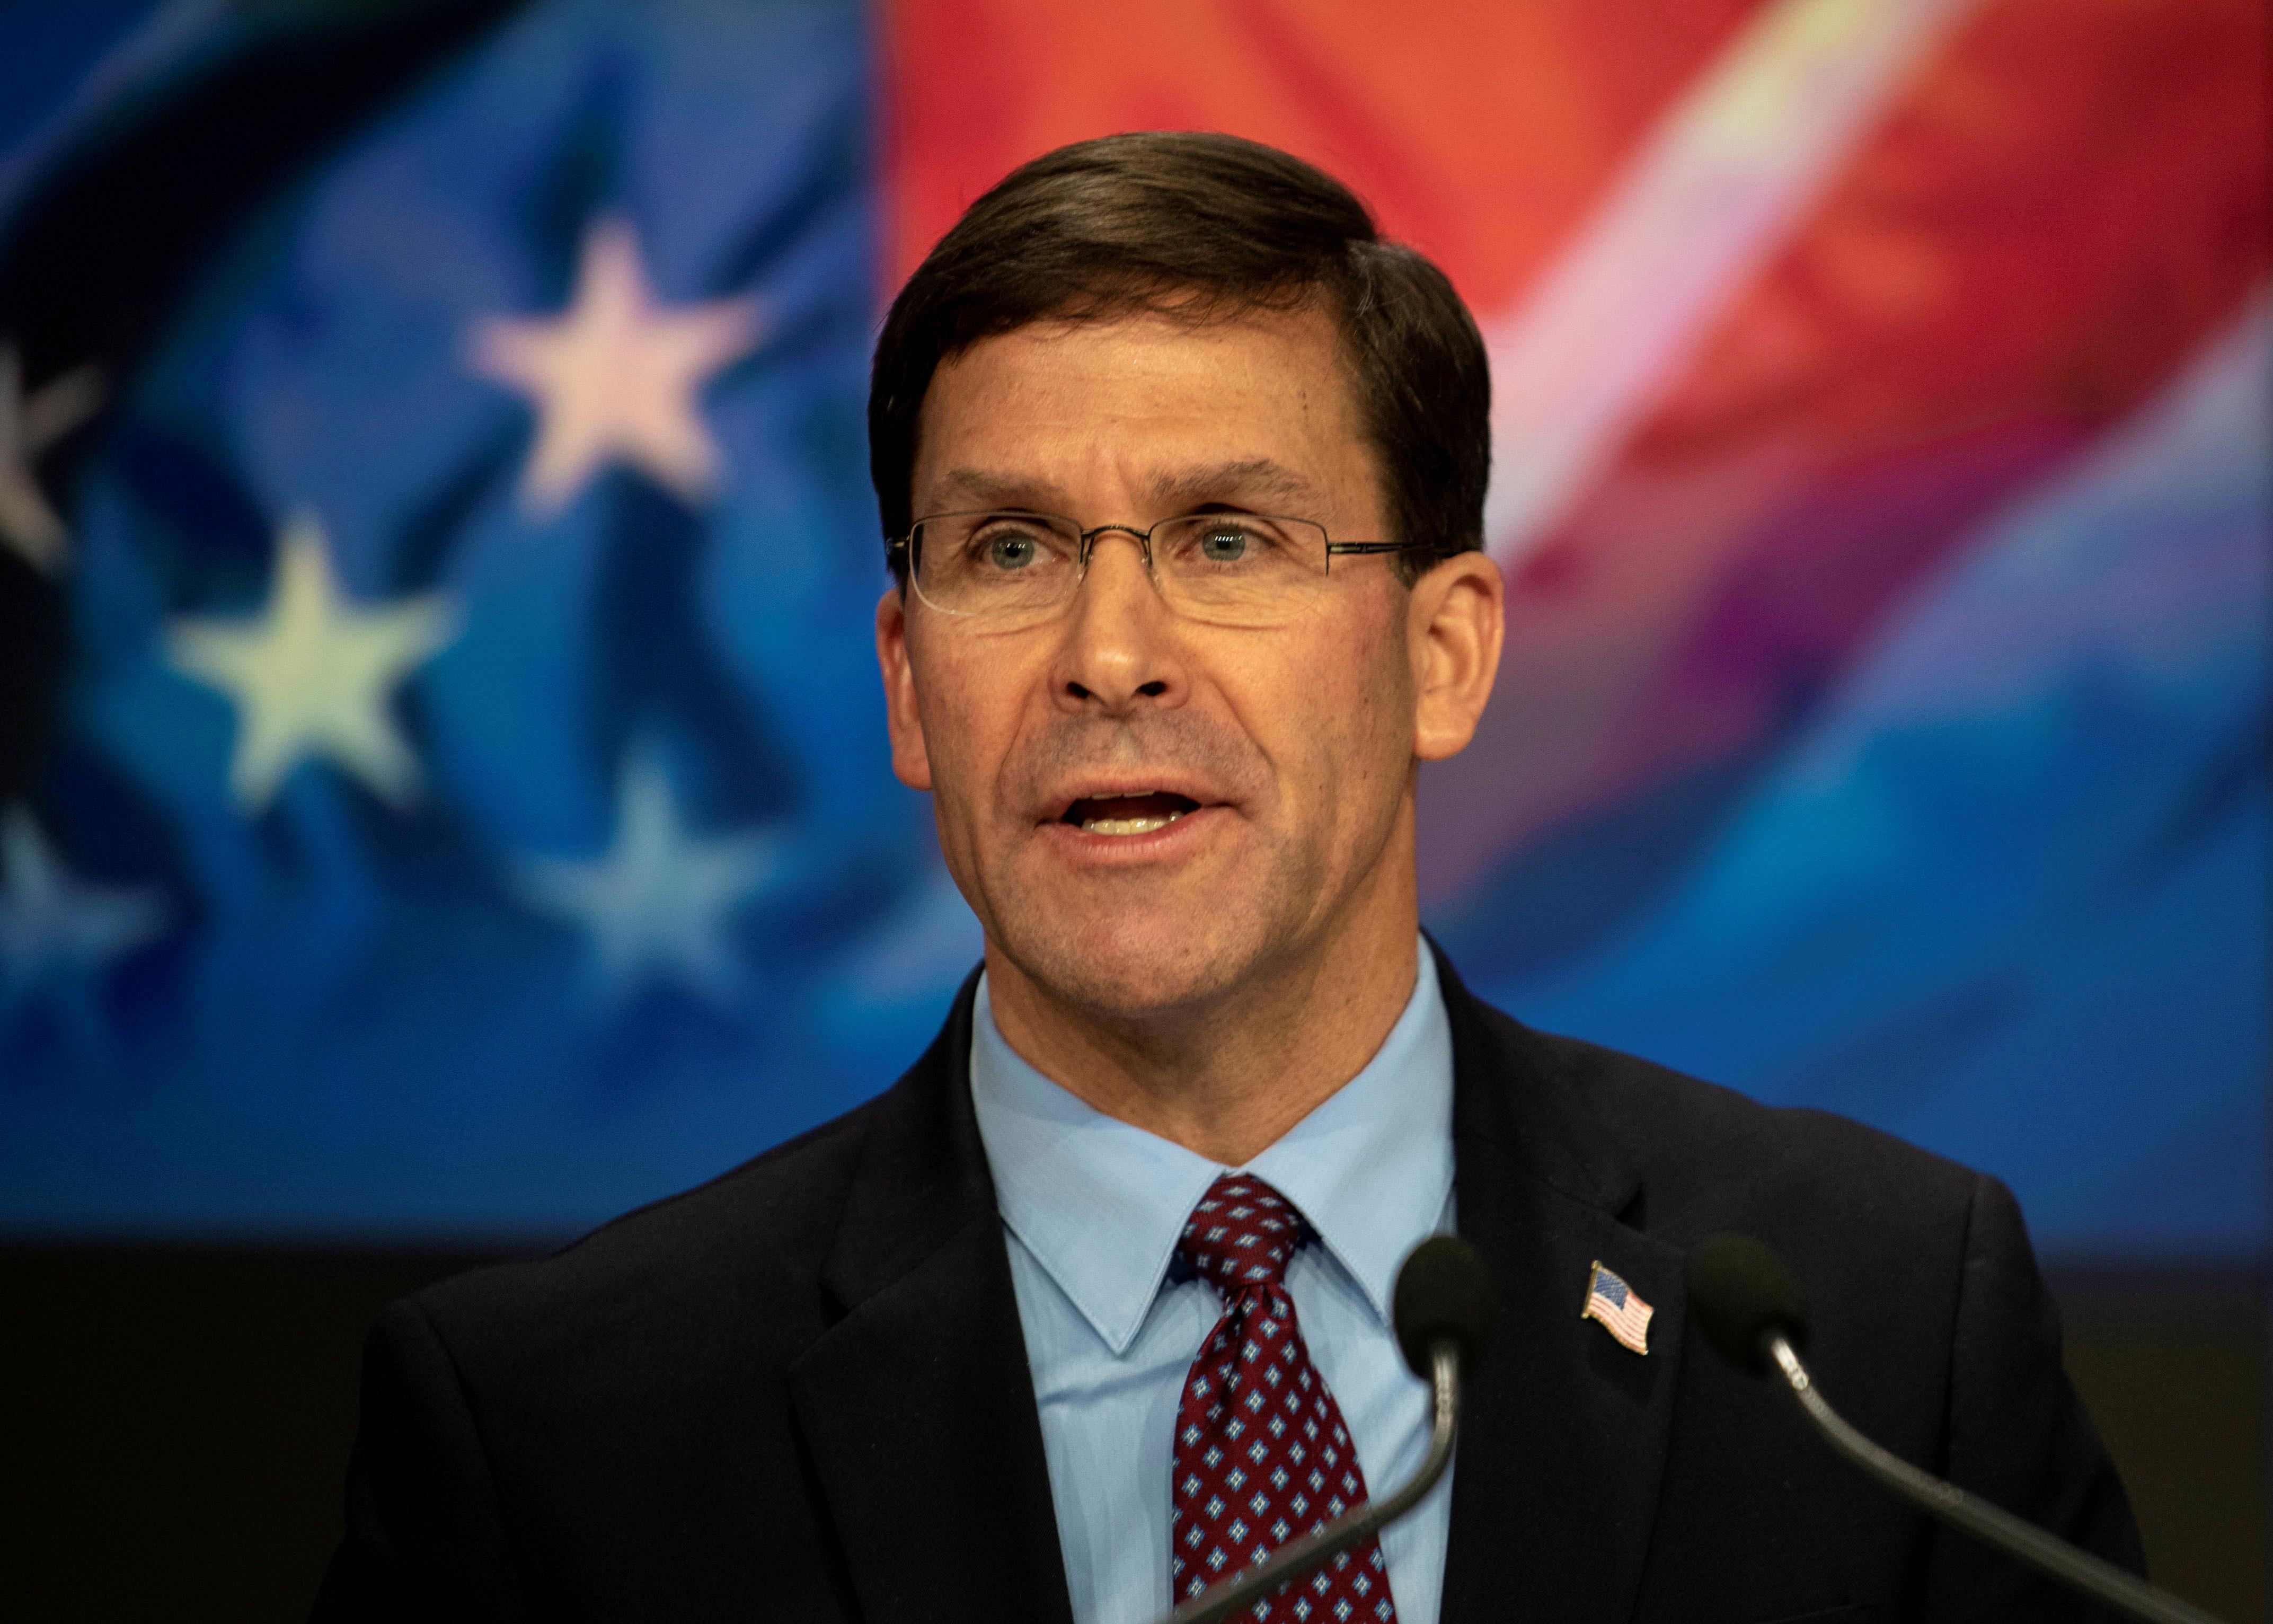 U.S. defense secretary securing military bases after Florida shooting